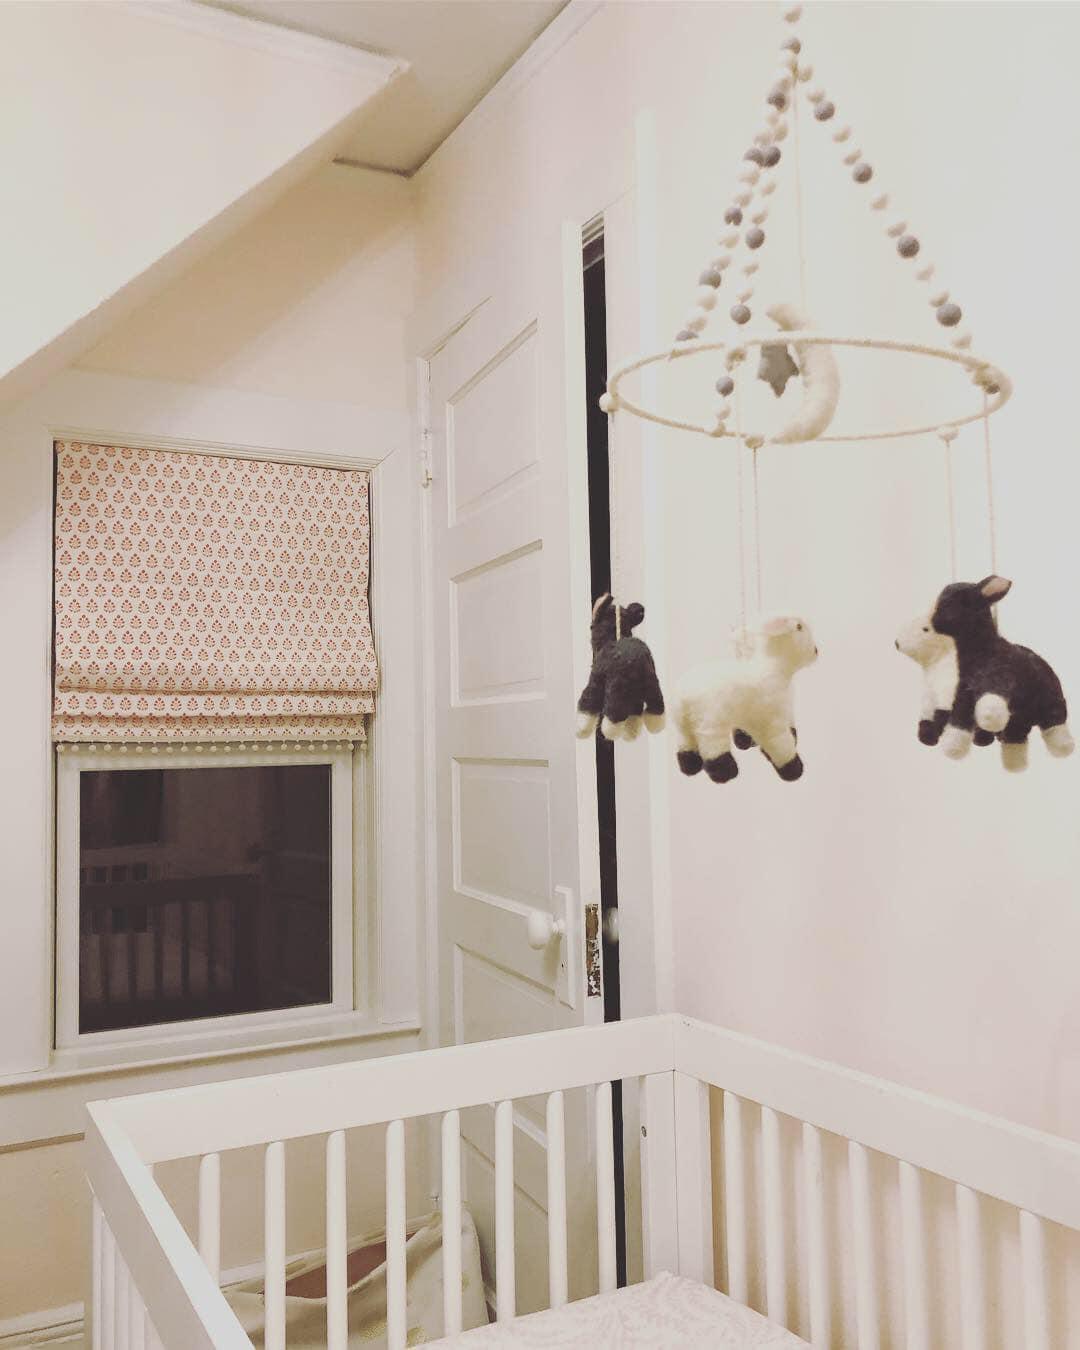 nurseryromanshade.jpg